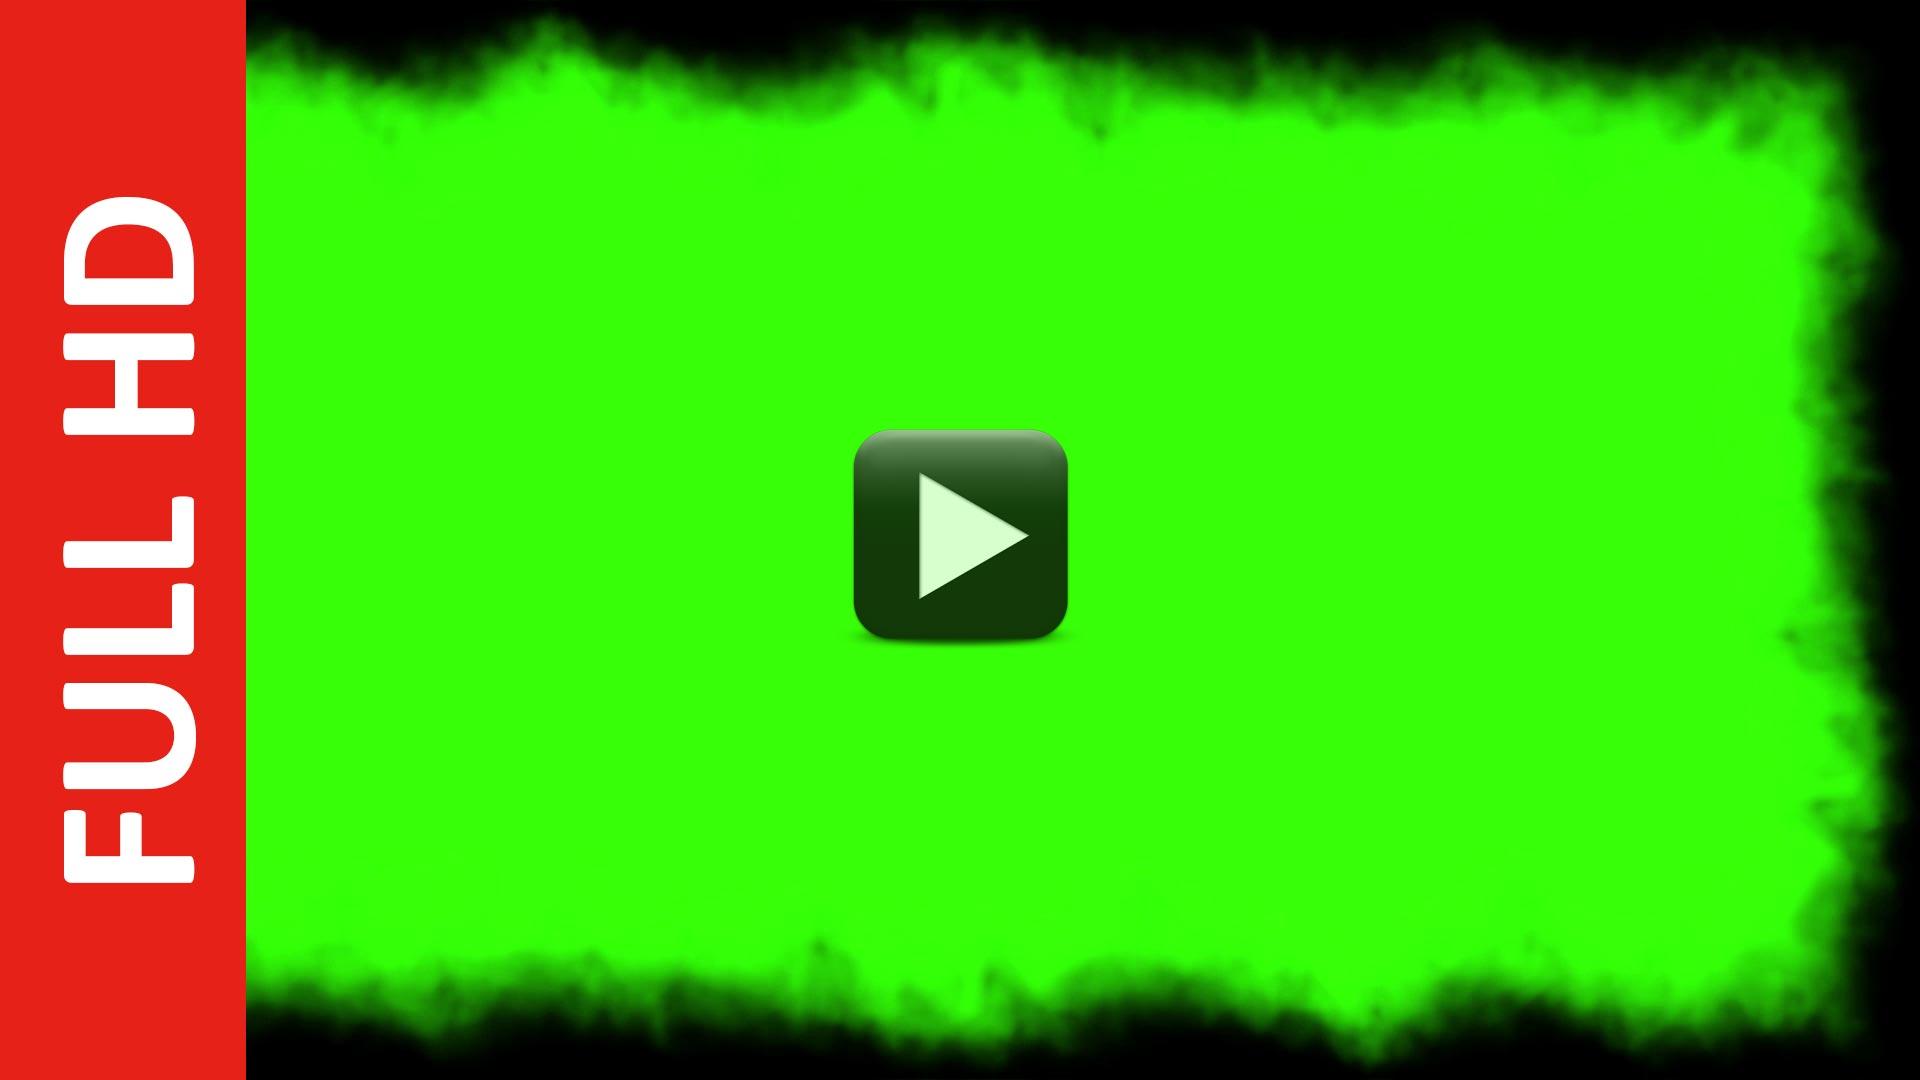 Smoke Green Screen Dust Frame Video HD ✓ Effect | All Design Creative